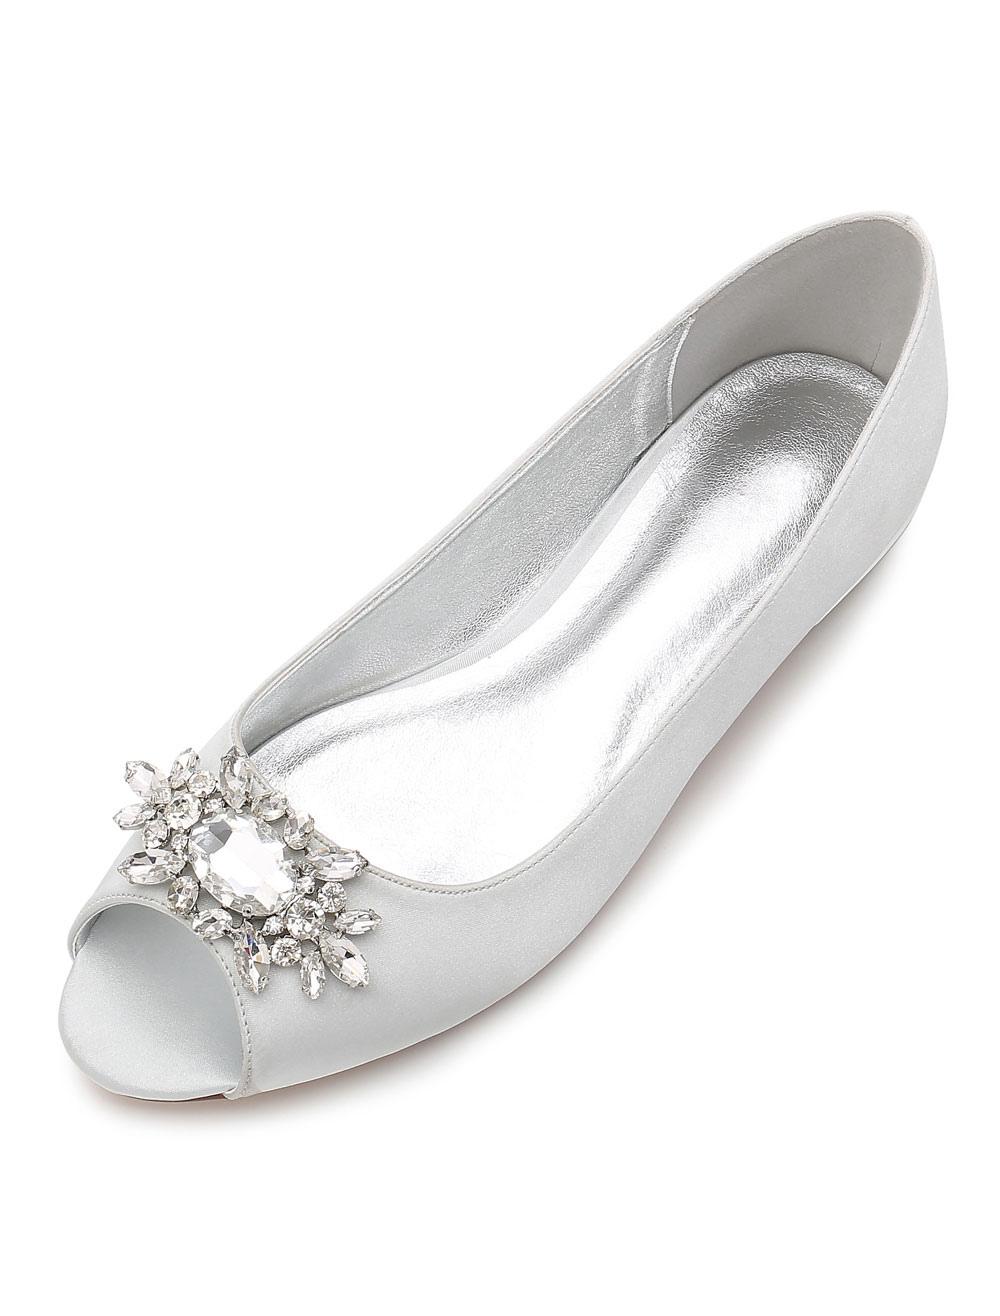 Mother Of Bride Shoes Peep Toe Rhinestones Wedding Guest